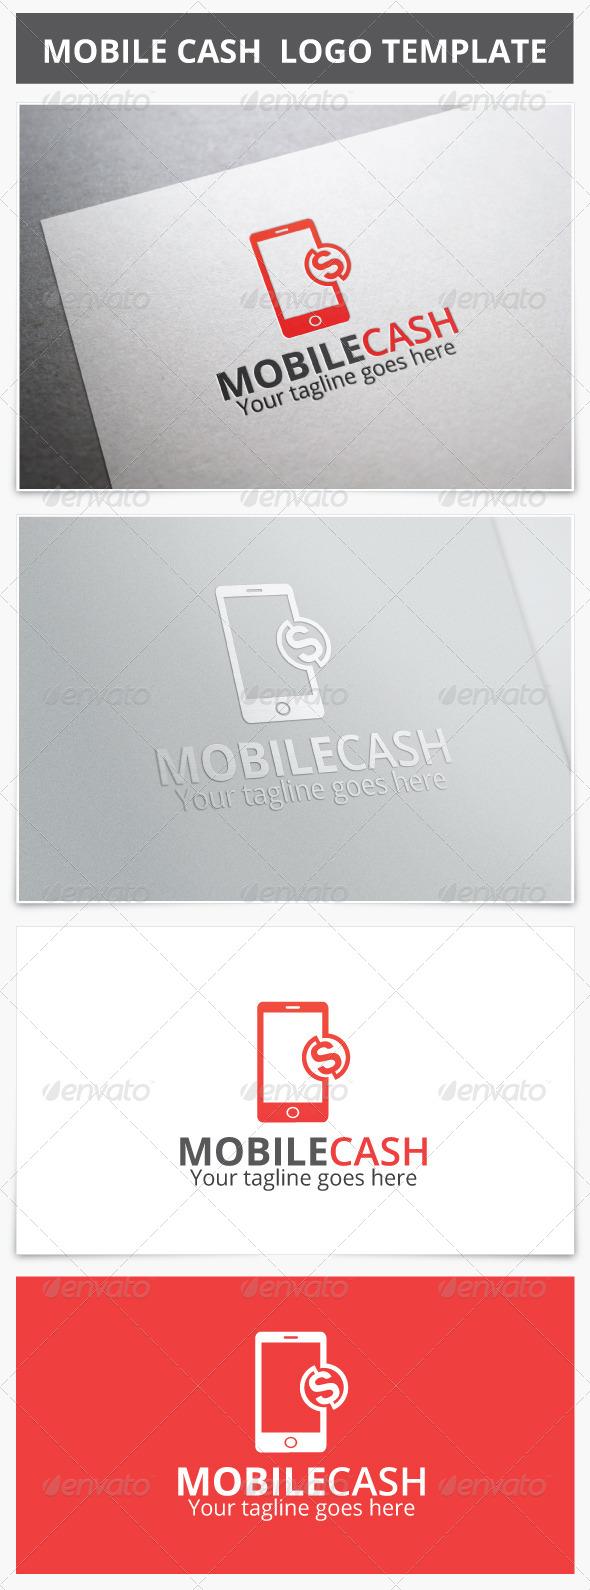 Mobile Cash Logo